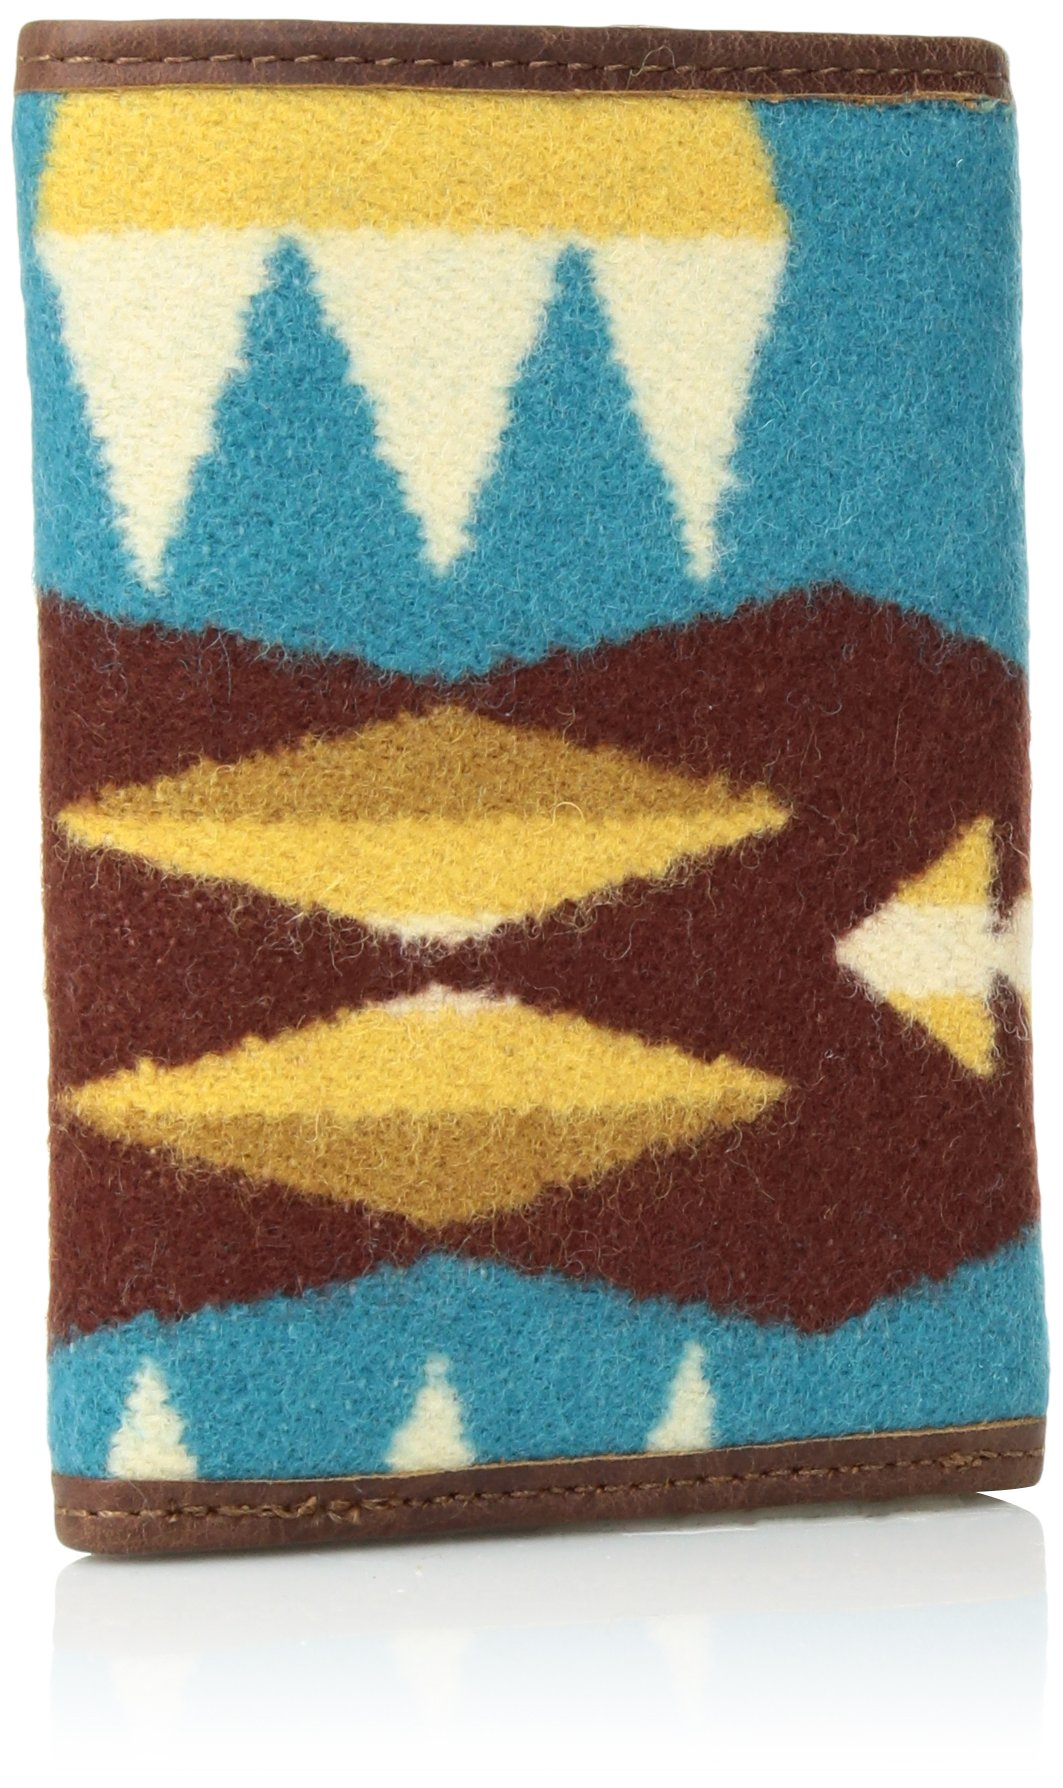 Pendleton Men's Trifold Wallet, Tucson Turquoise, One Size by Pendleton (Image #2)